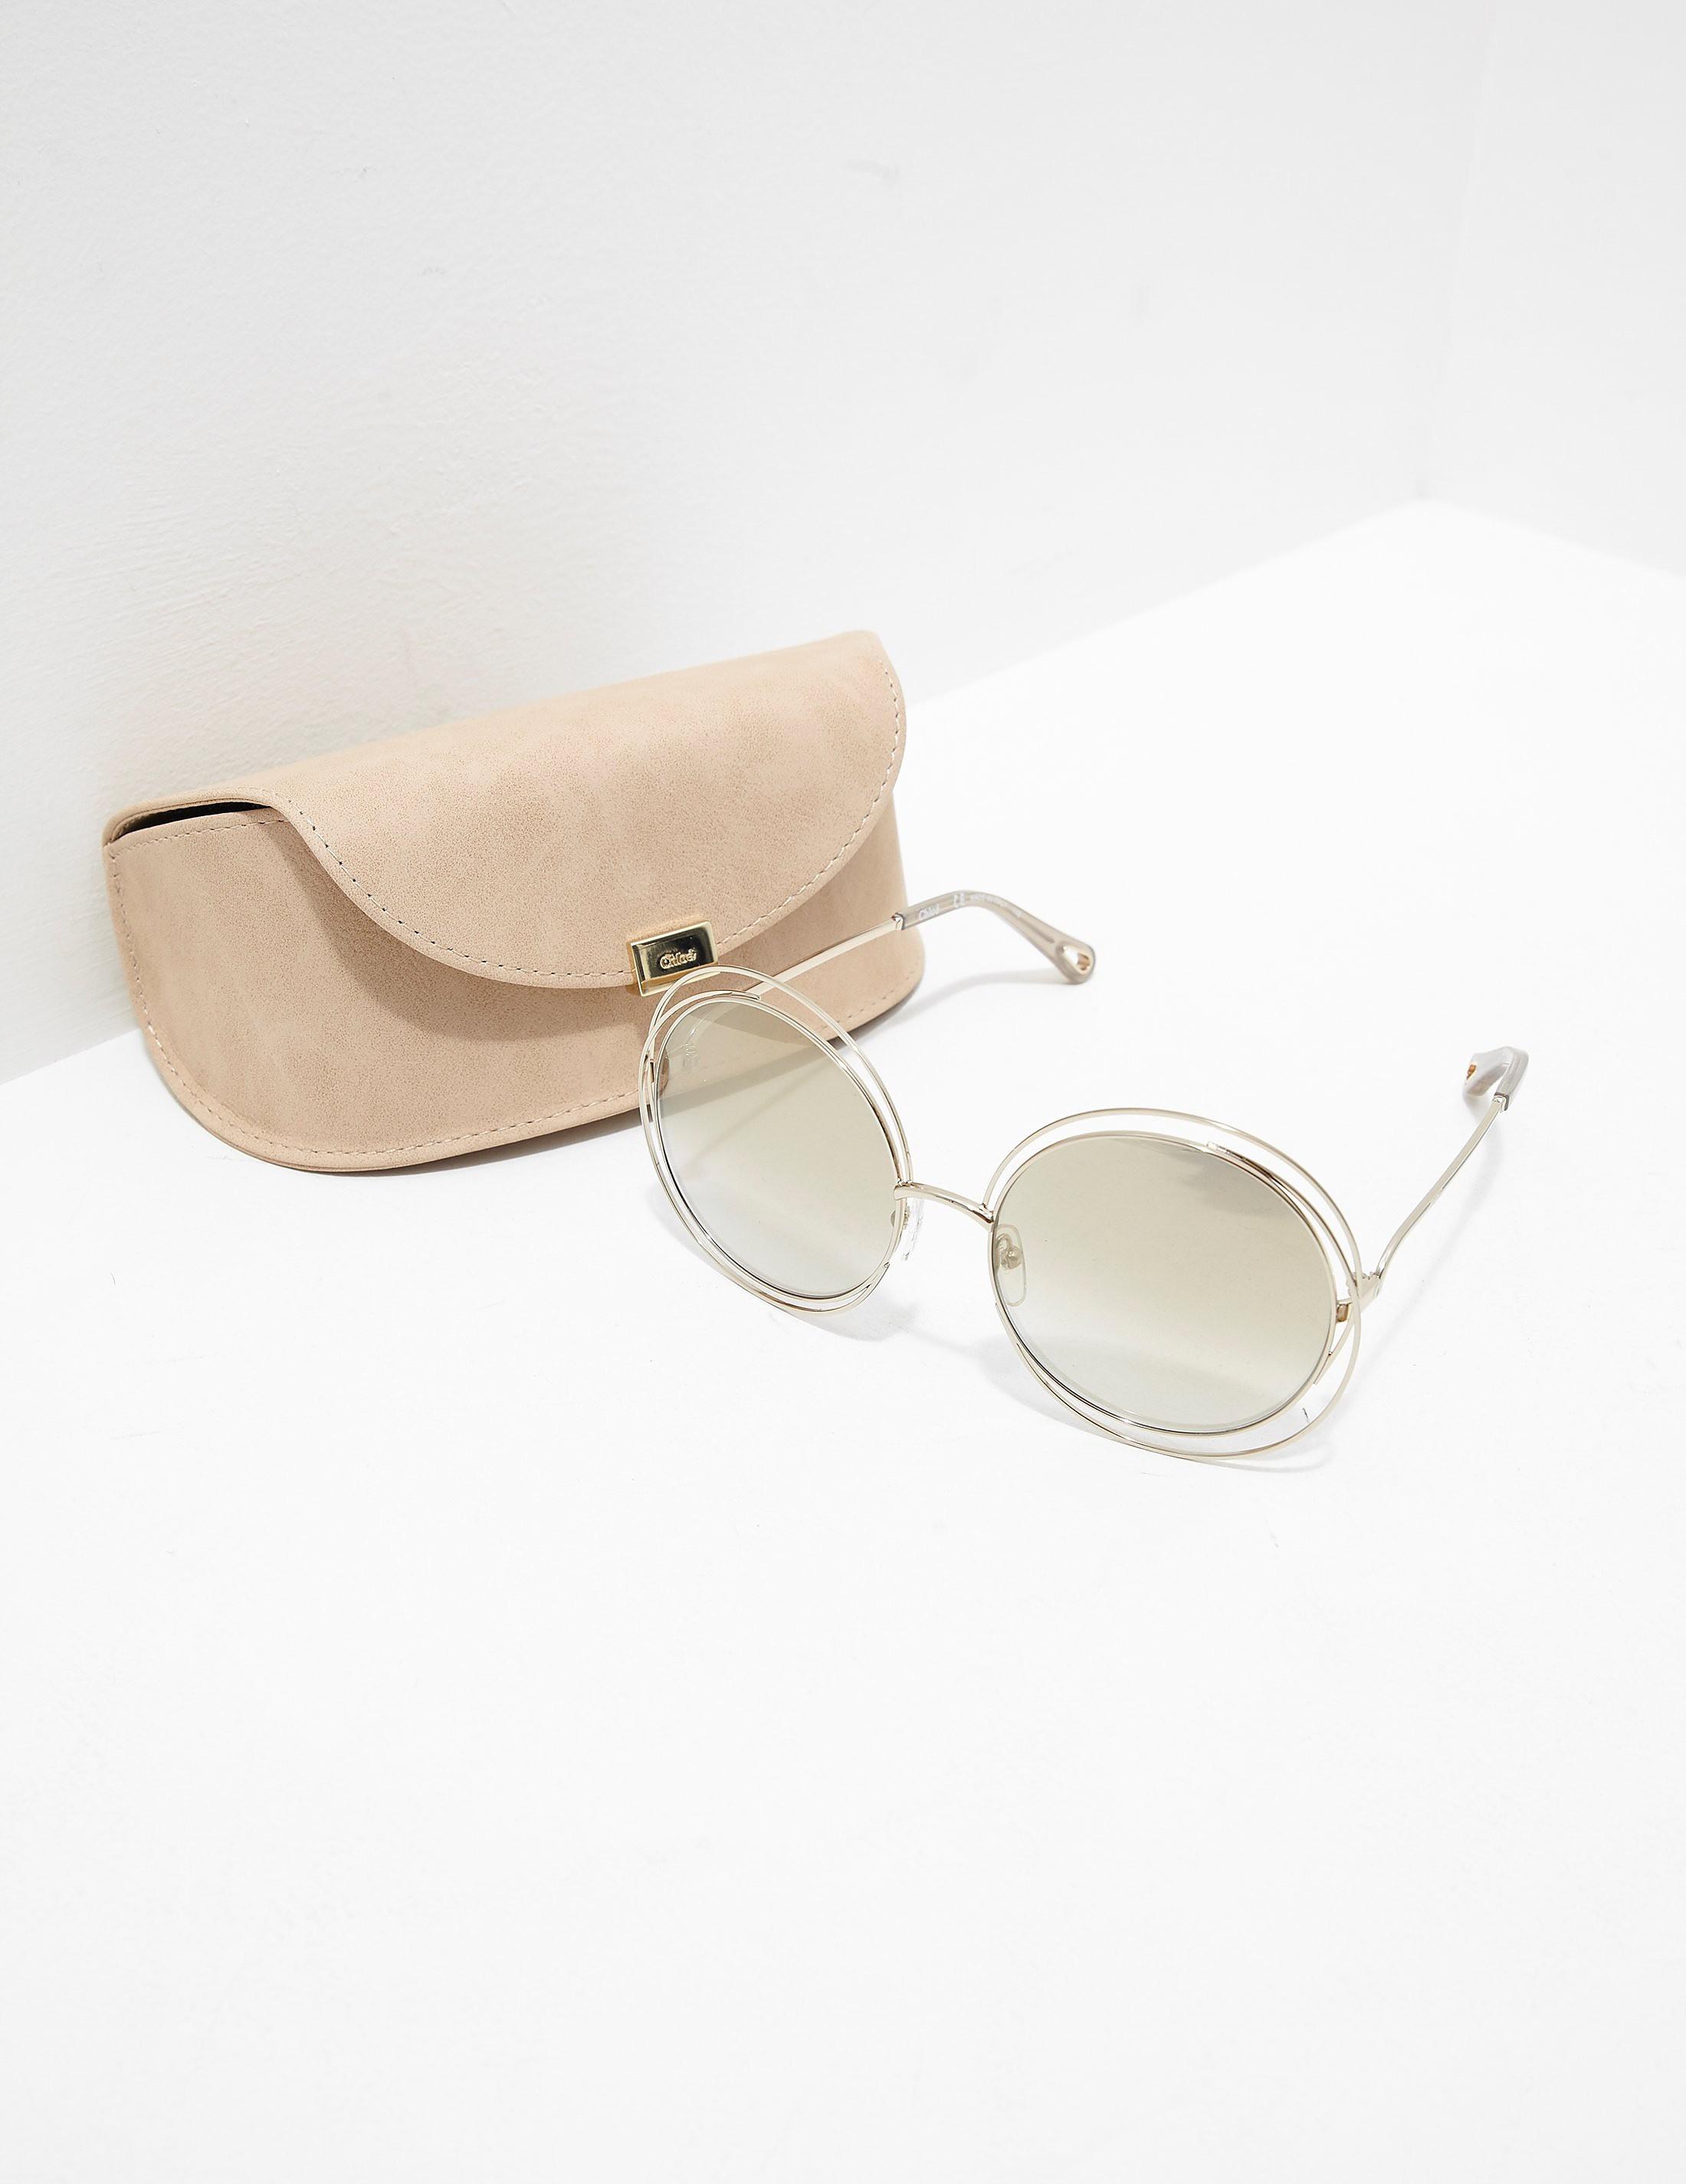 Chloe Metal Round Sunglasses - Online Exclusive